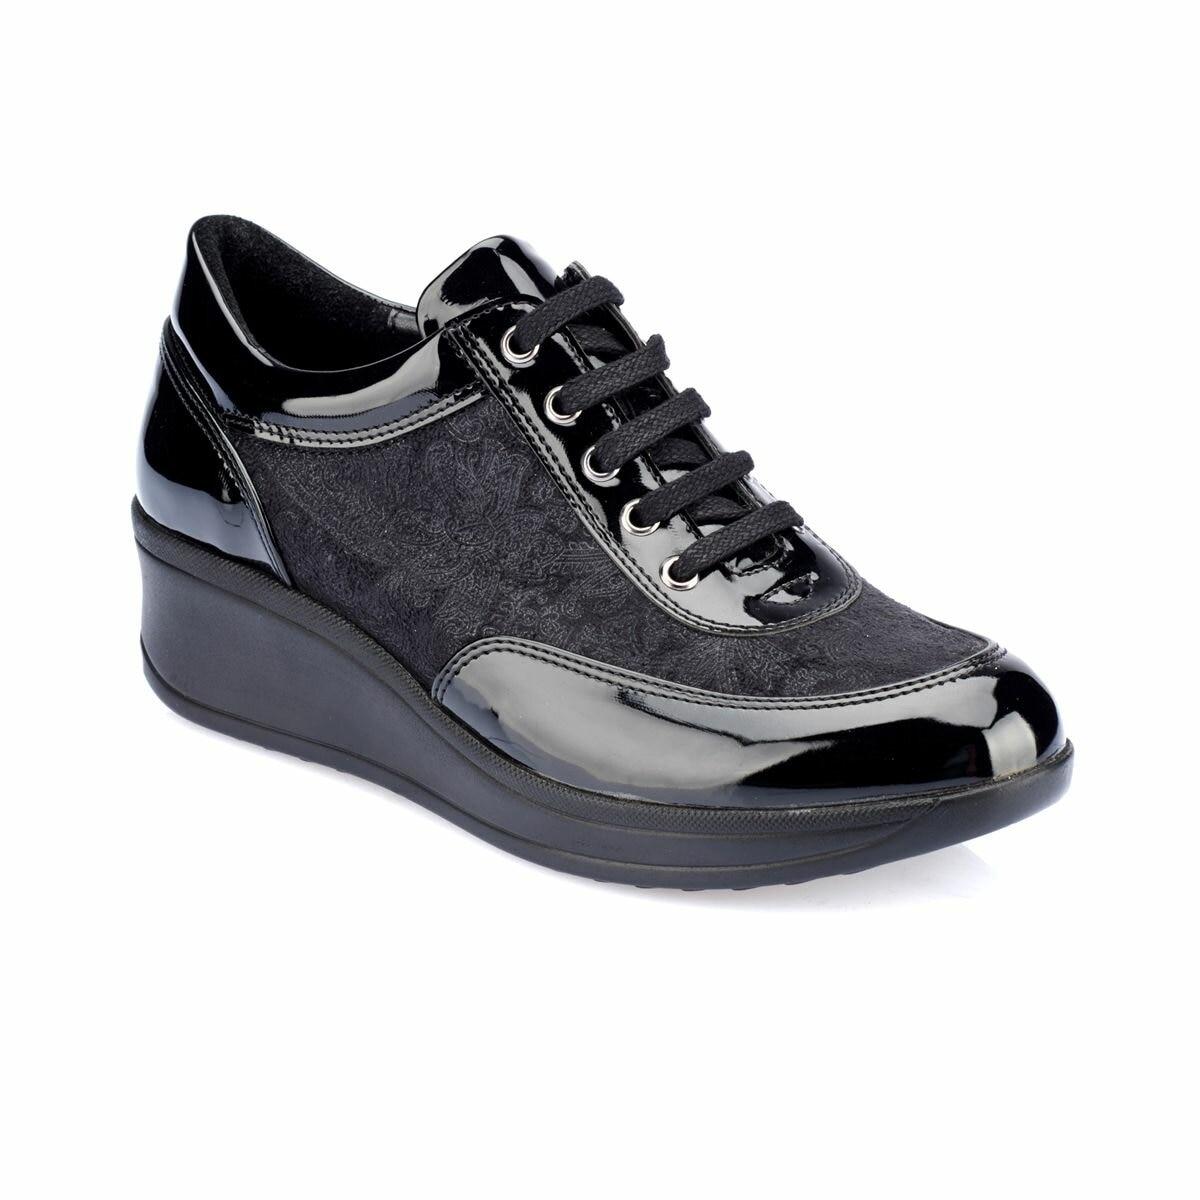 FLO TRV8210 Black Women Shoes Polaris